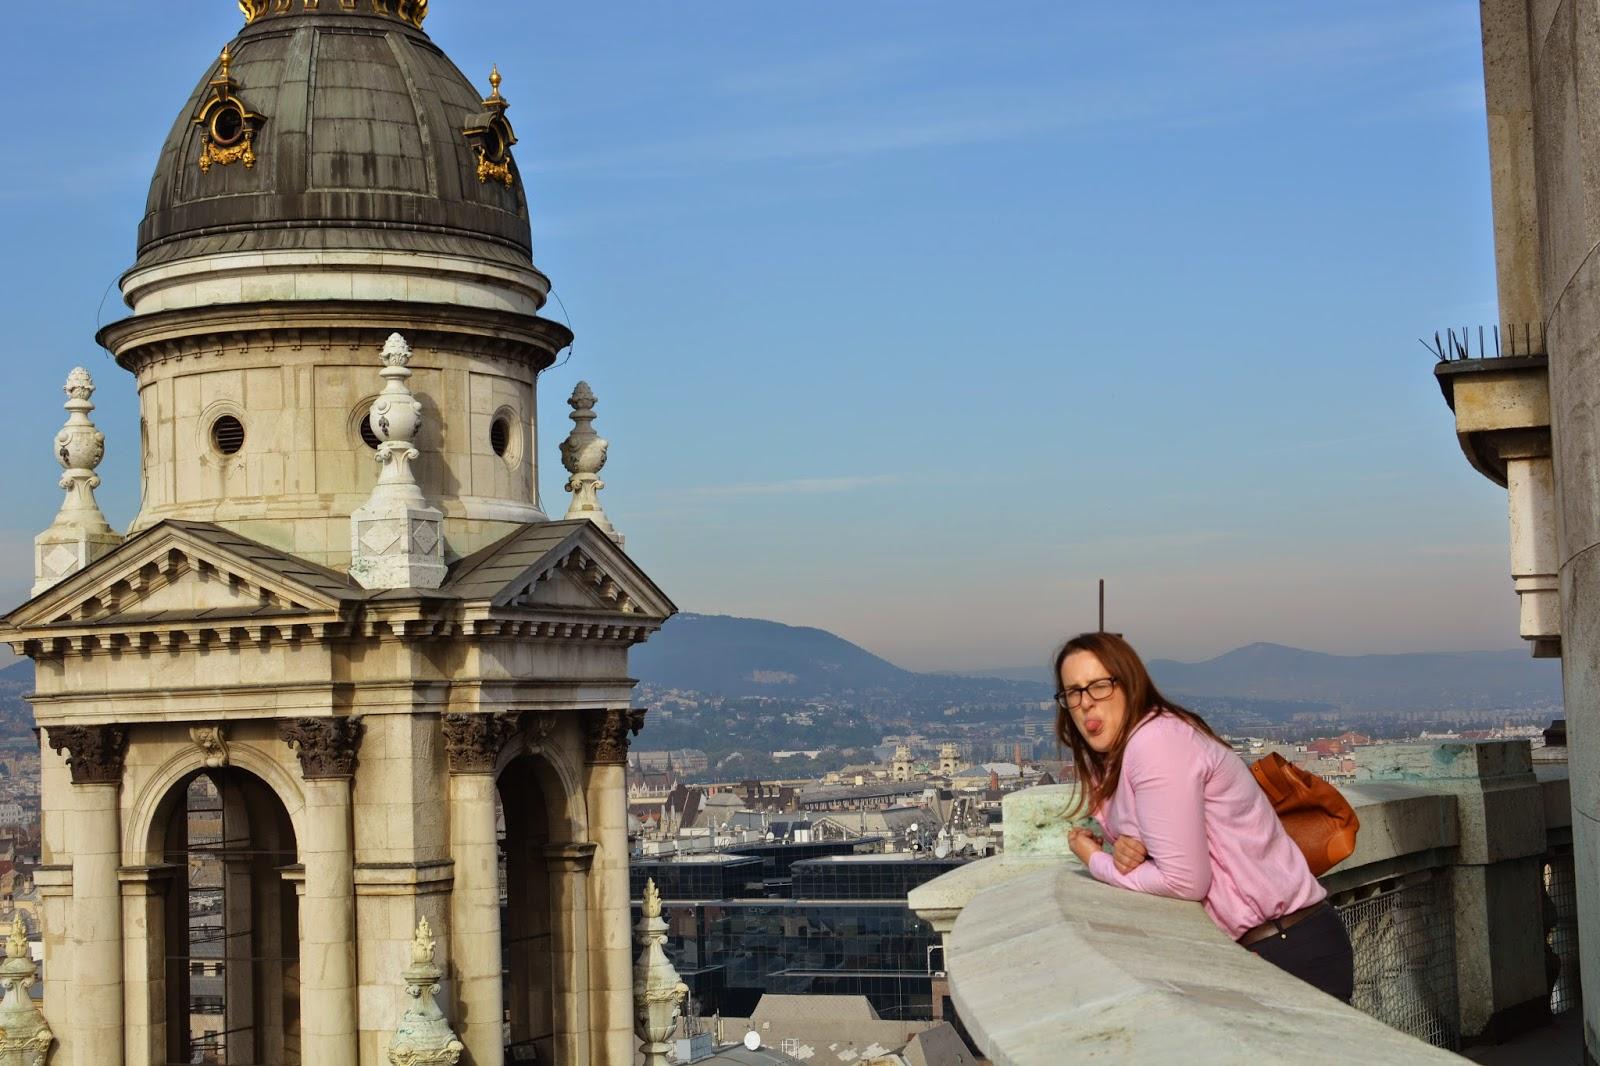 St Stephen's Basilica Dome Budapest